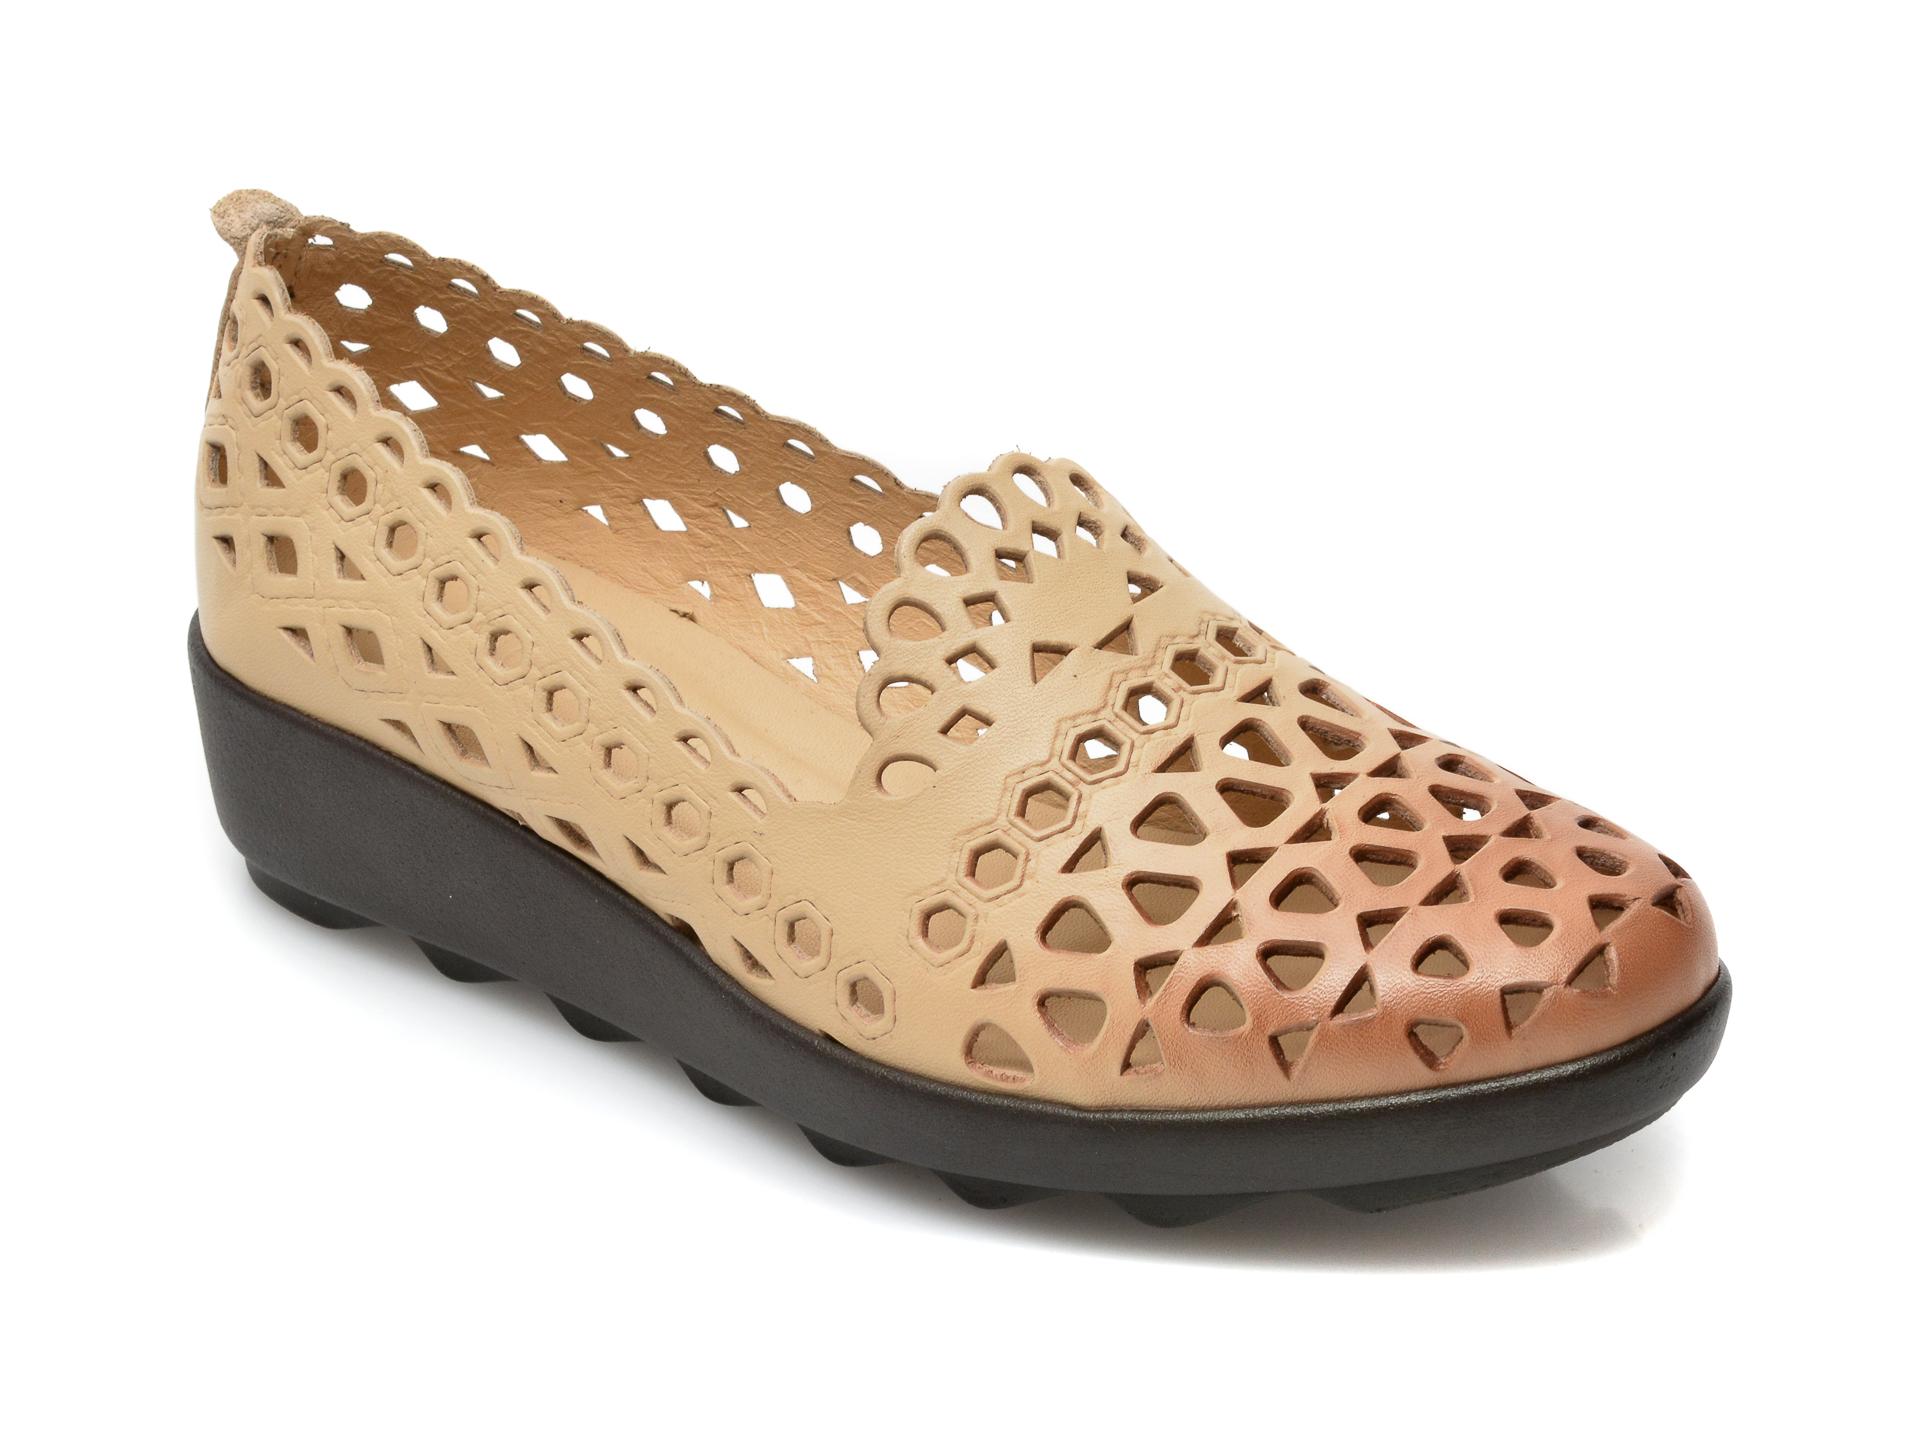 Pantofi FLAVIA PASSINI bej, 1011, din piele naturala imagine otter.ro 2021